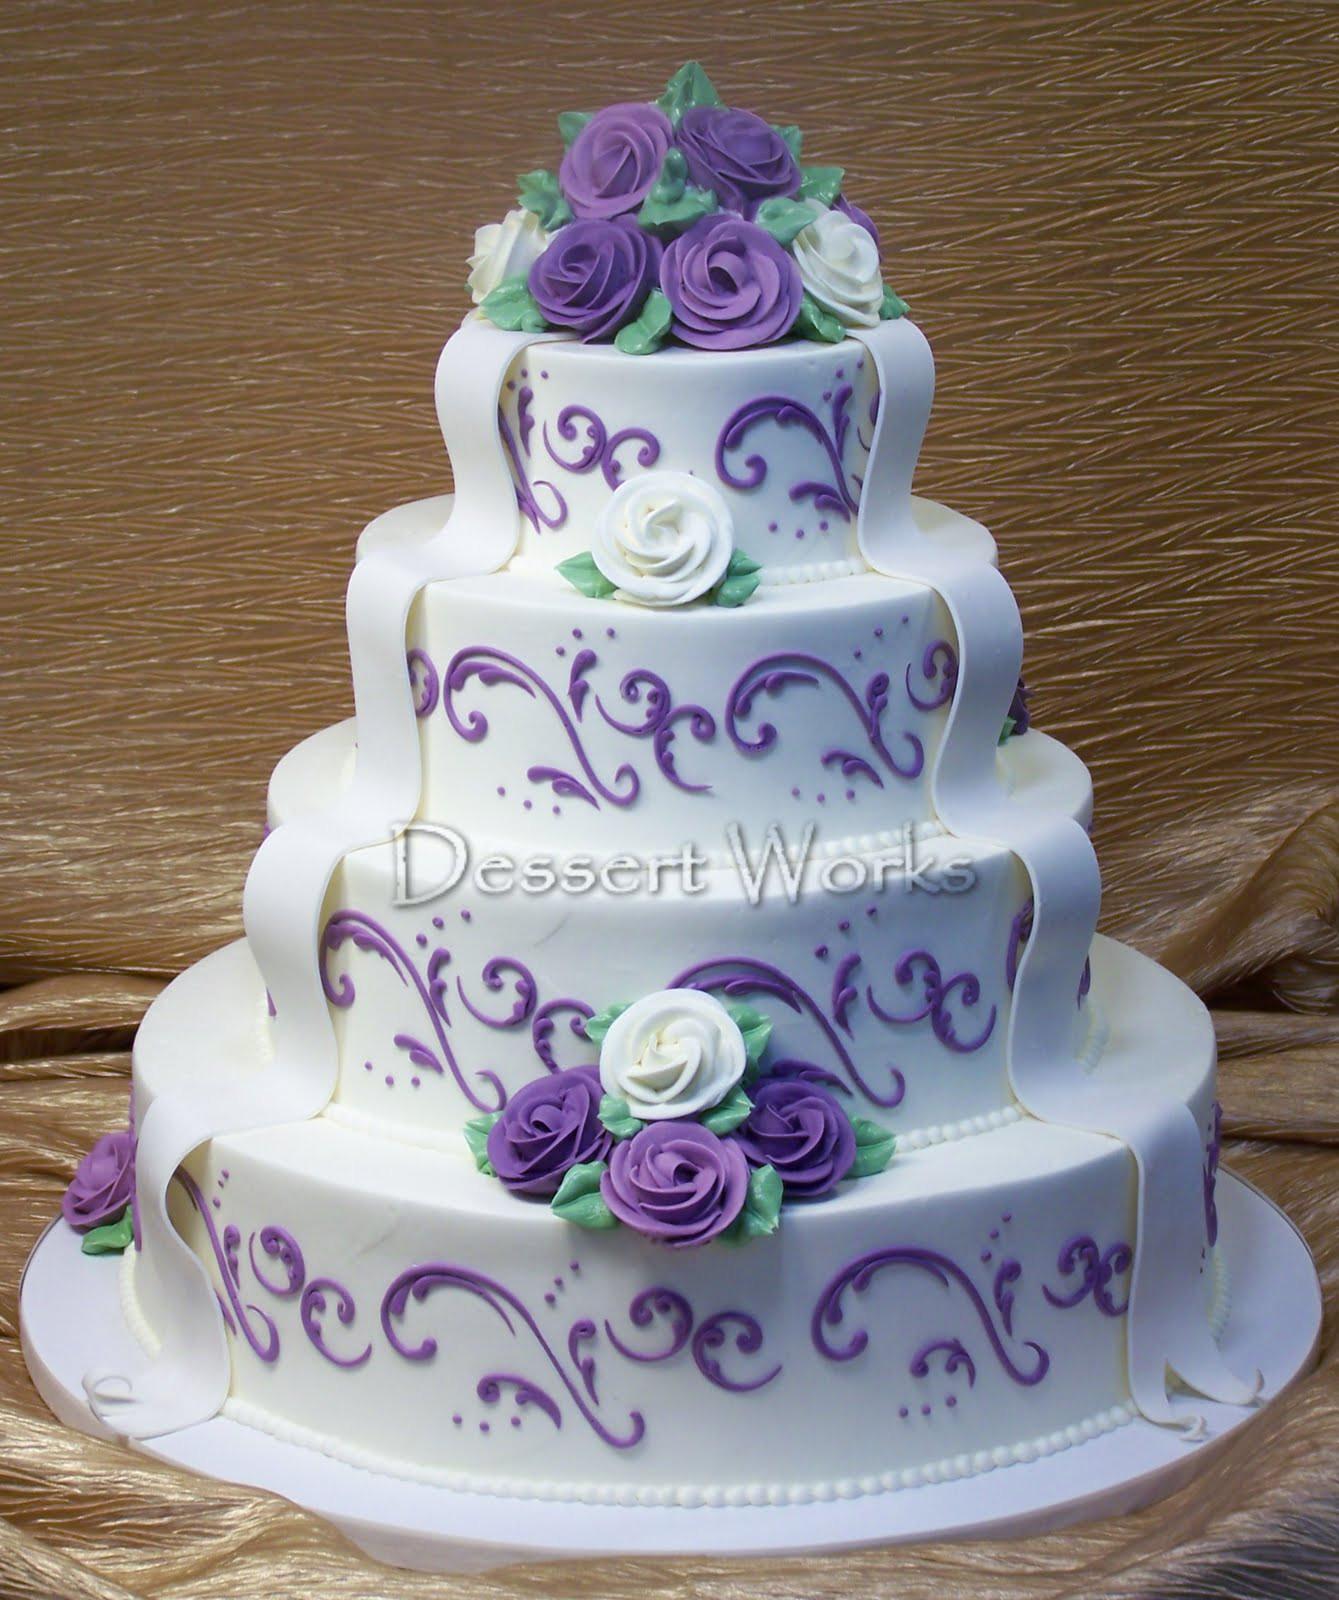 Lavender Wedding Cakes Pictures  Dessert Works Bakery July 2010